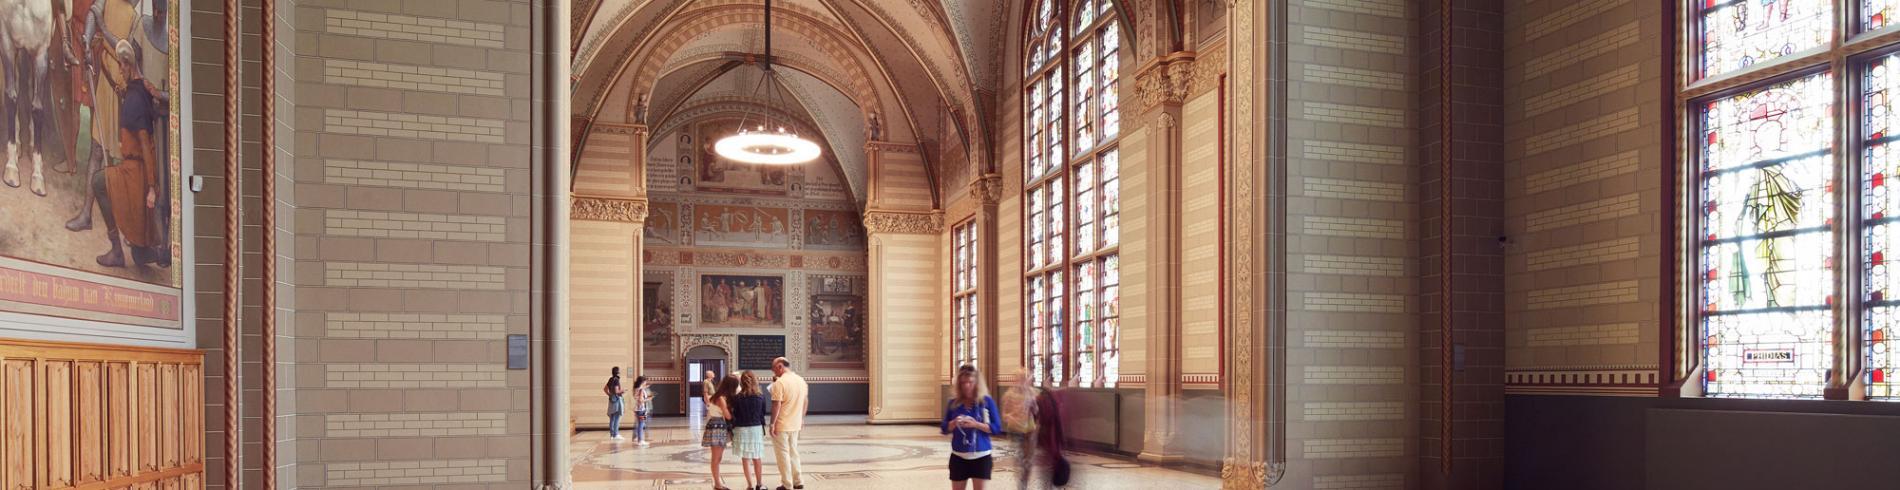 Get your Dutch master fix at the Rijkmuseum